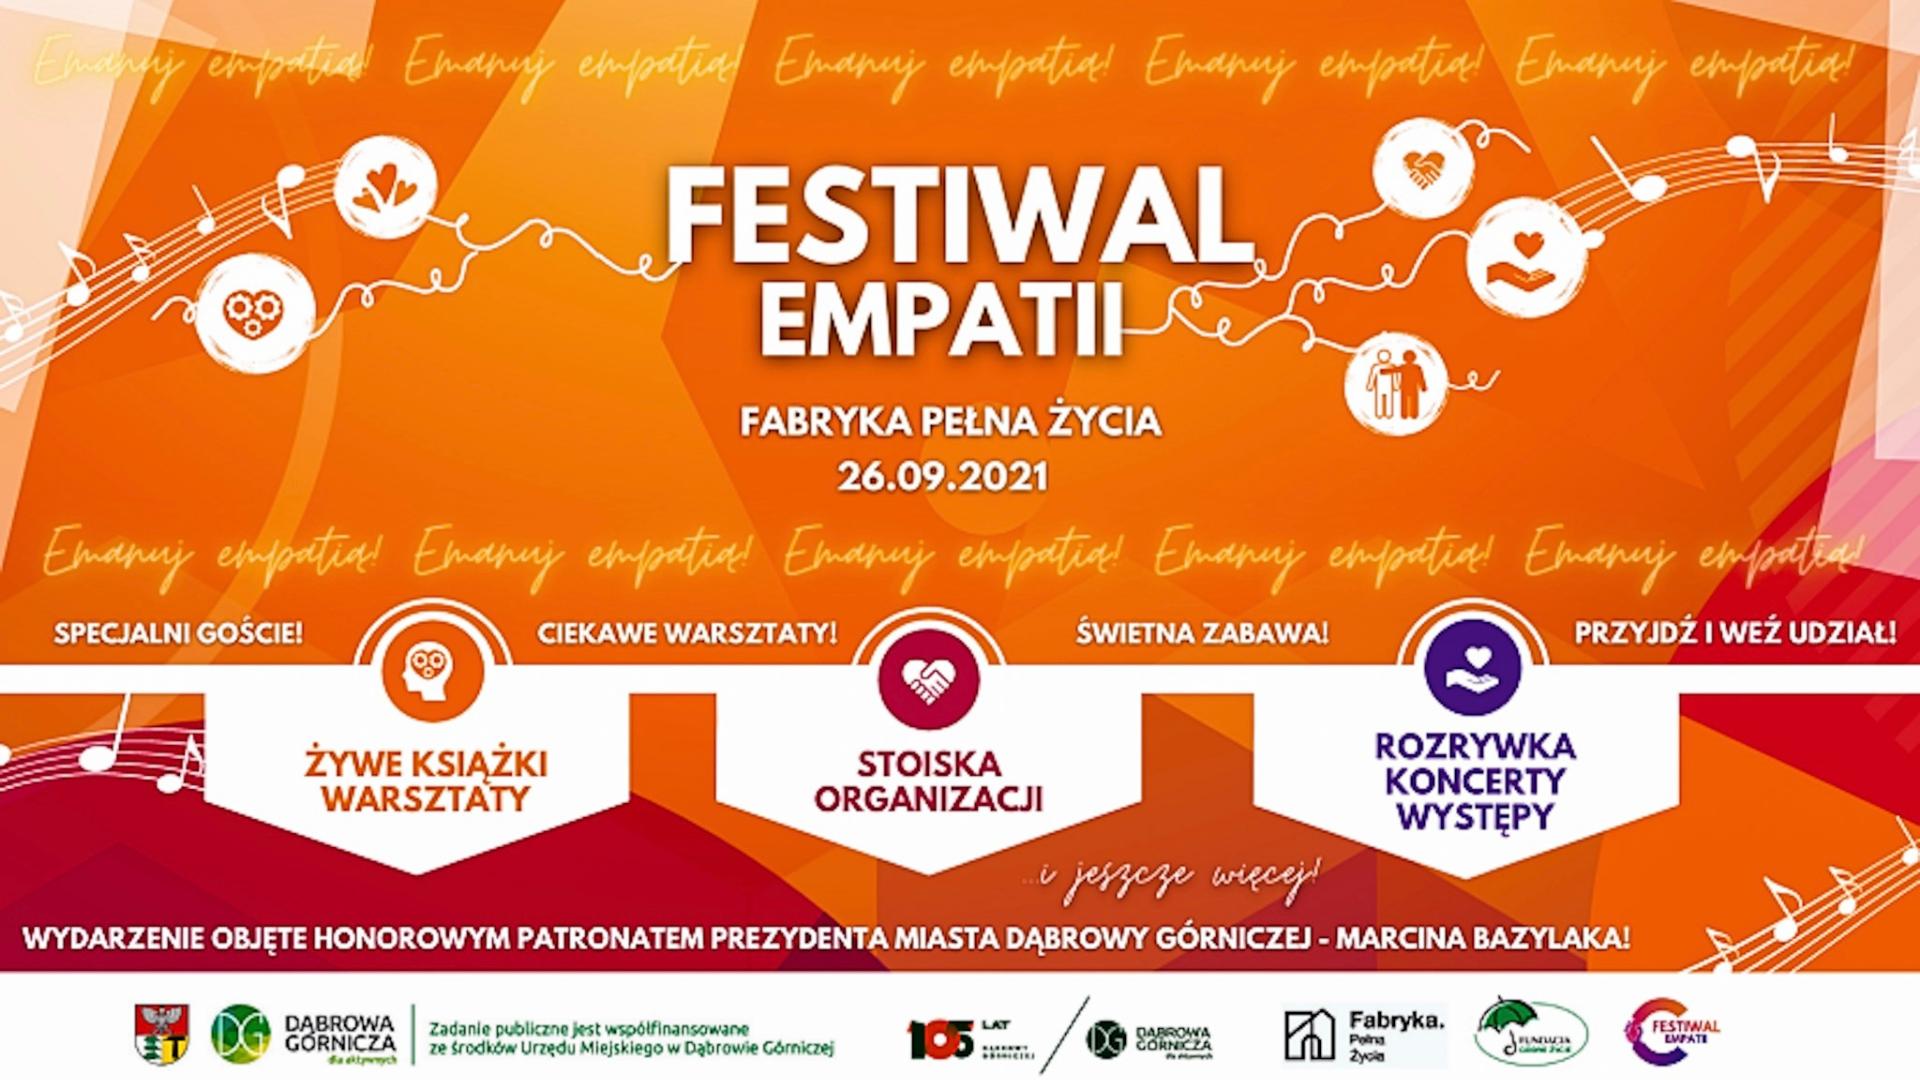 plakat na festiwal empatii